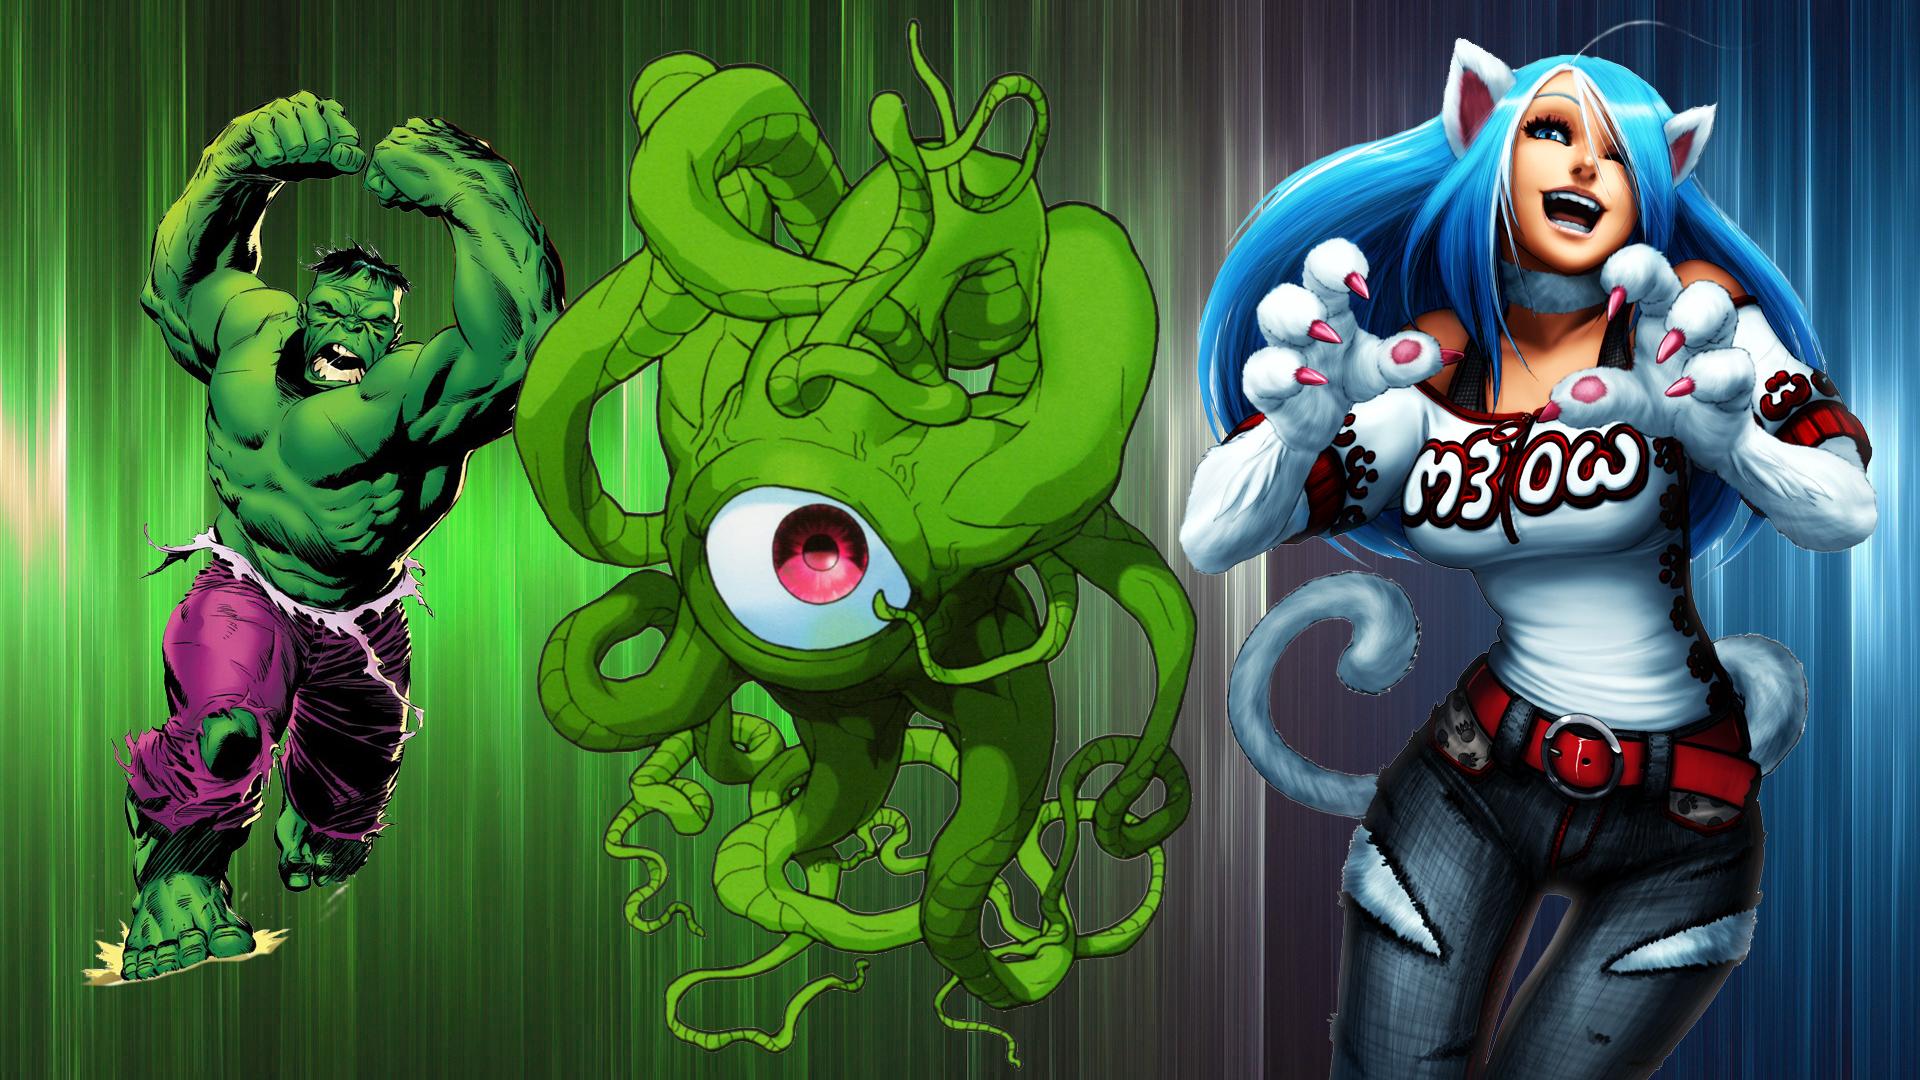 Wallpaper Fighting Games Felicia Character Shuma Gorath Hulk